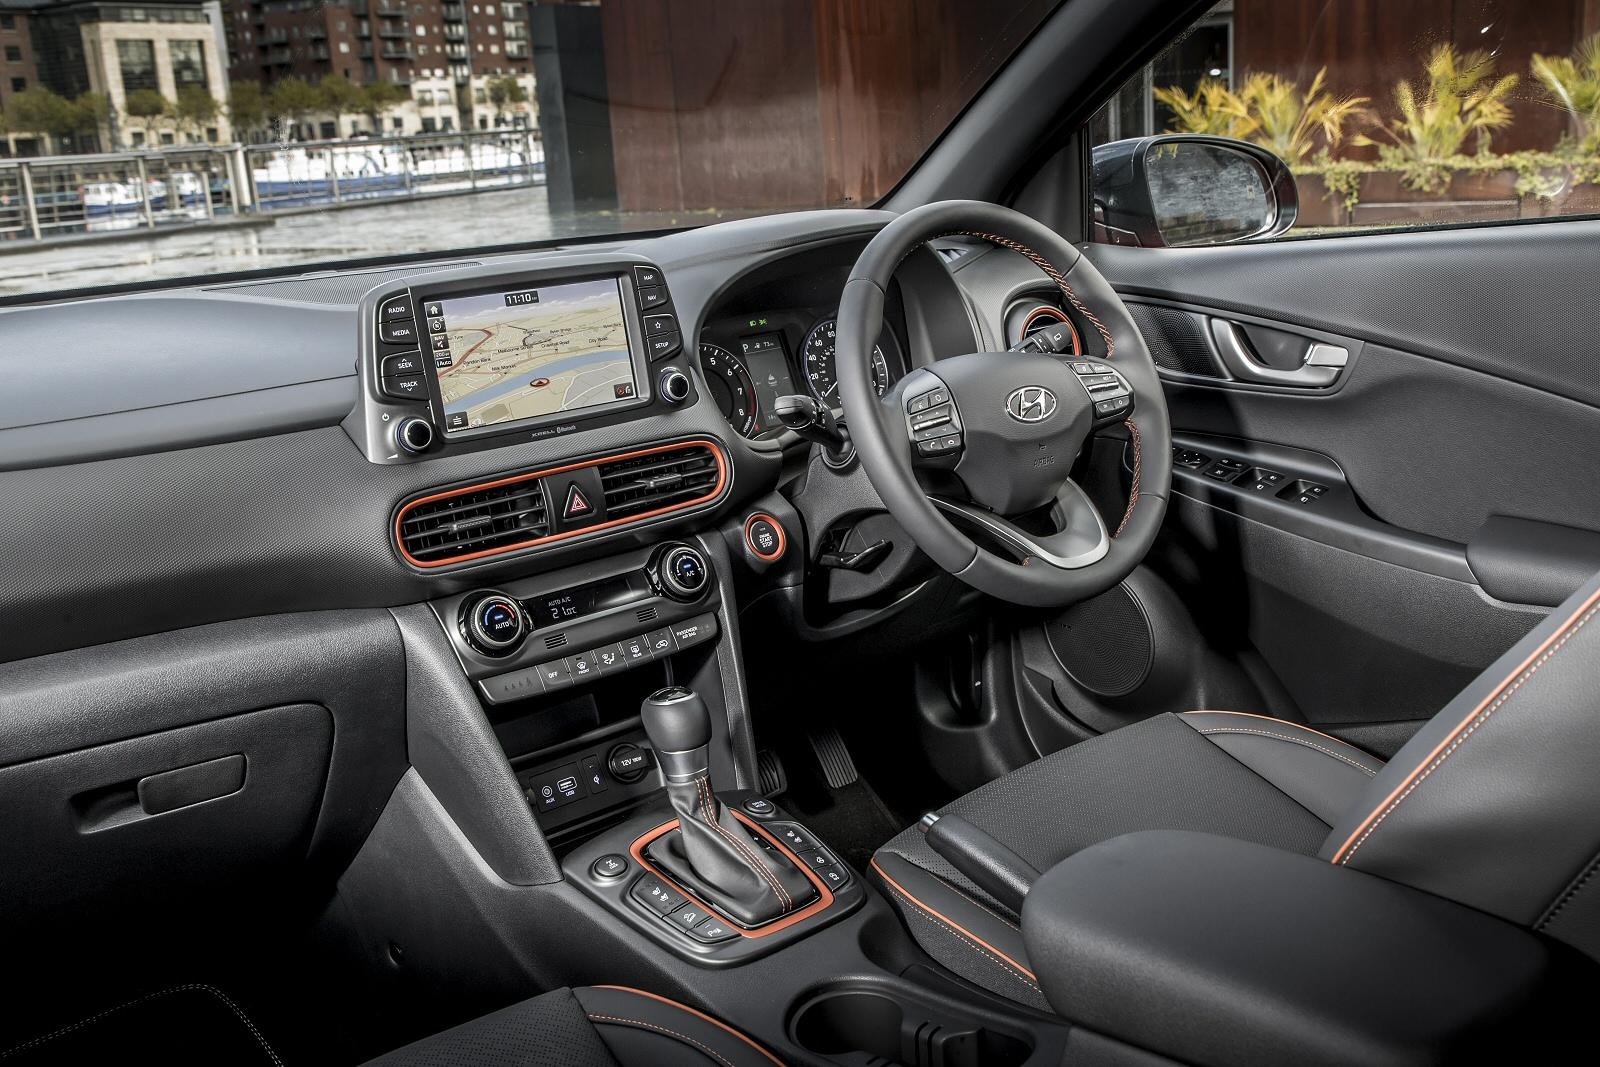 New Hyundai Kona 1 0t Gdi Blue Drive S 5dr Petrol